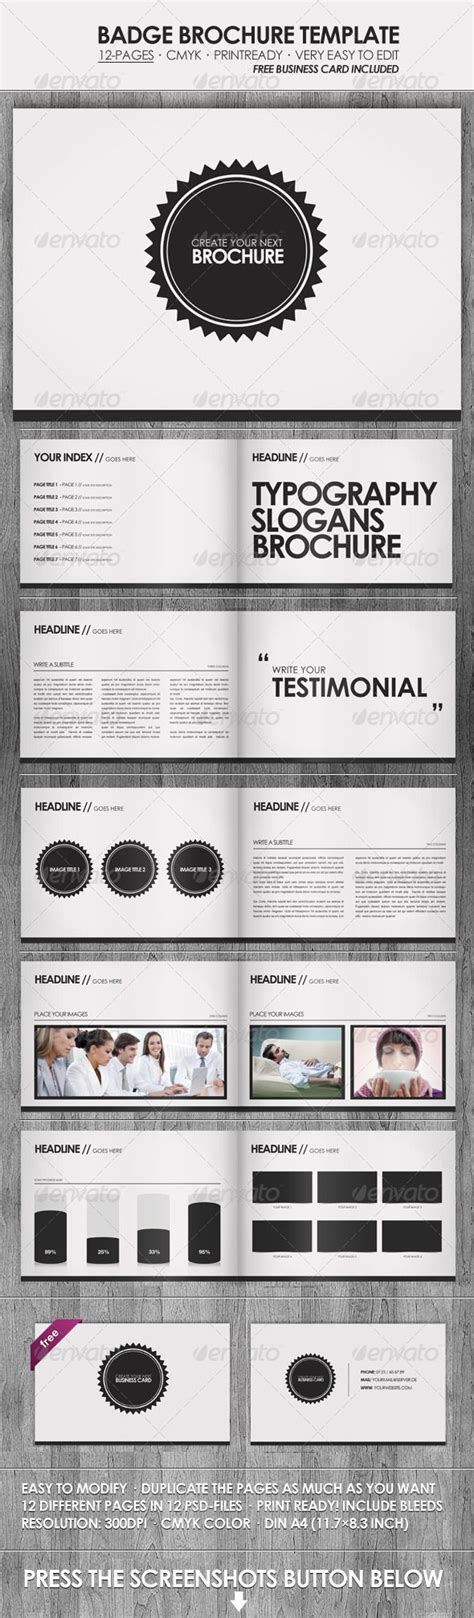 brochure templates kickass pinterest the world s catalog of ideas